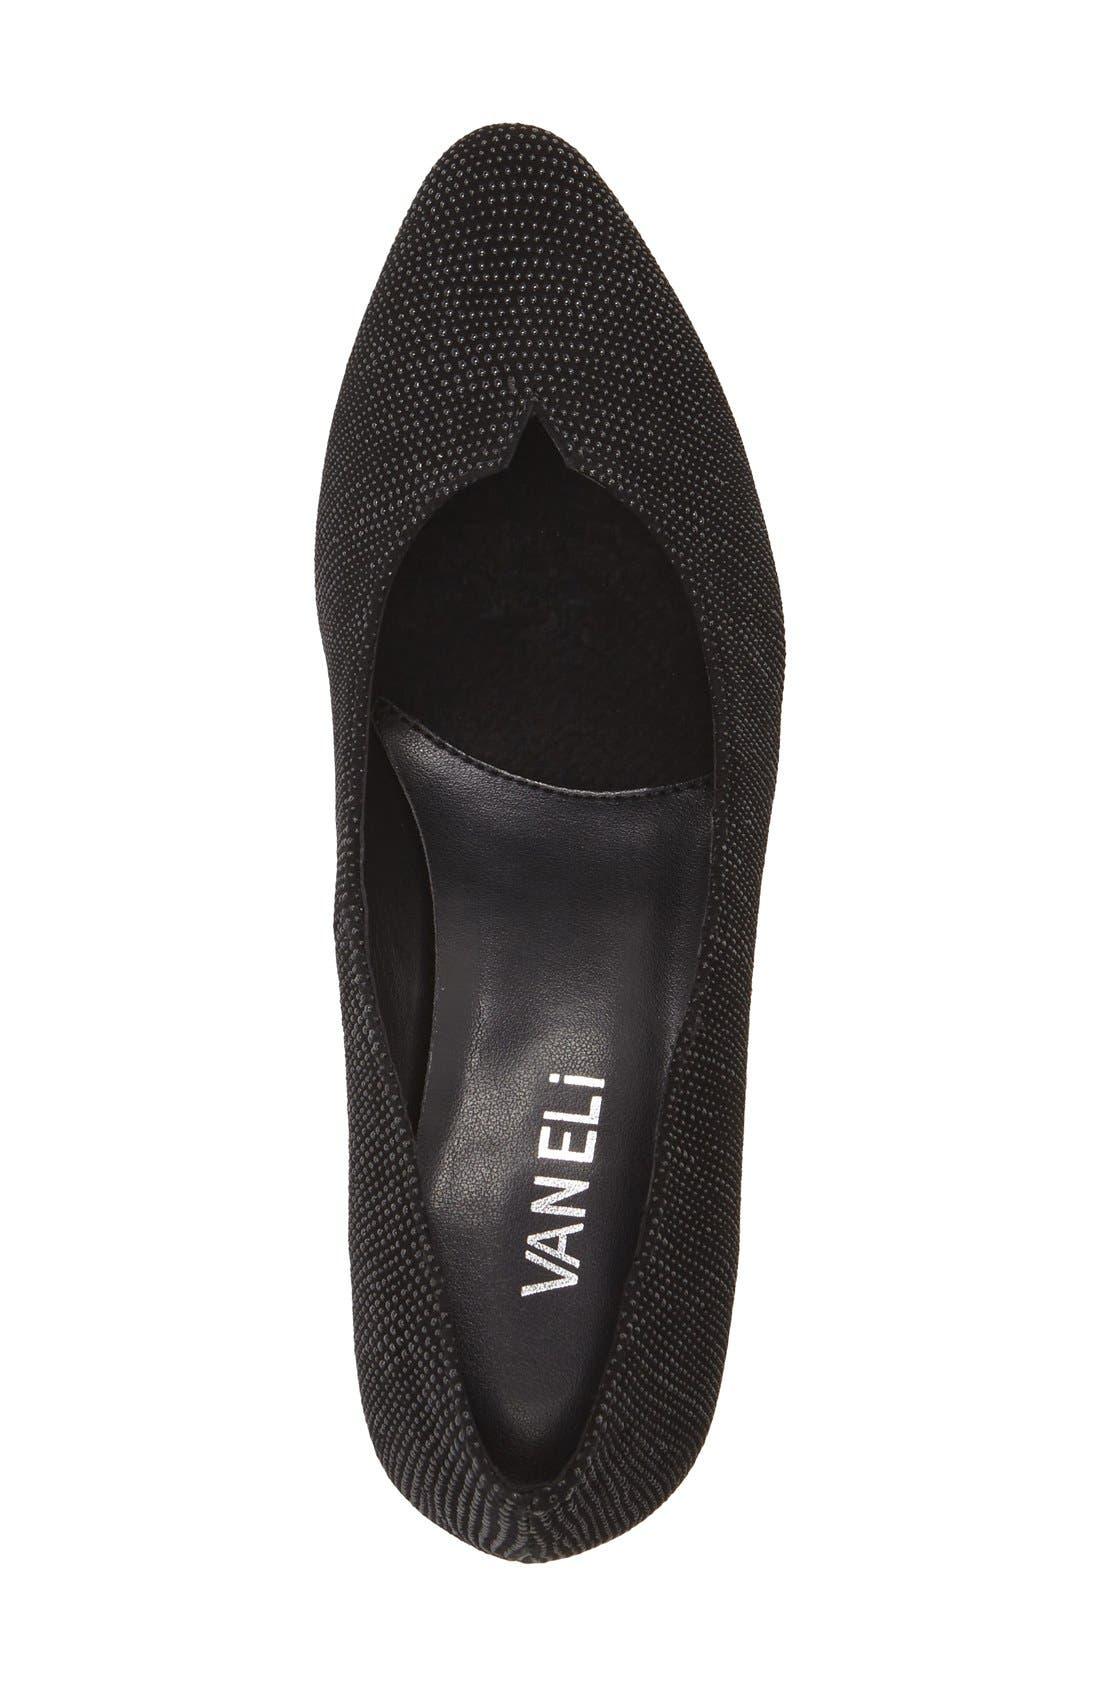 Alternate Image 3  - VANELi 'Linden' Almond Toe Pump (Women)